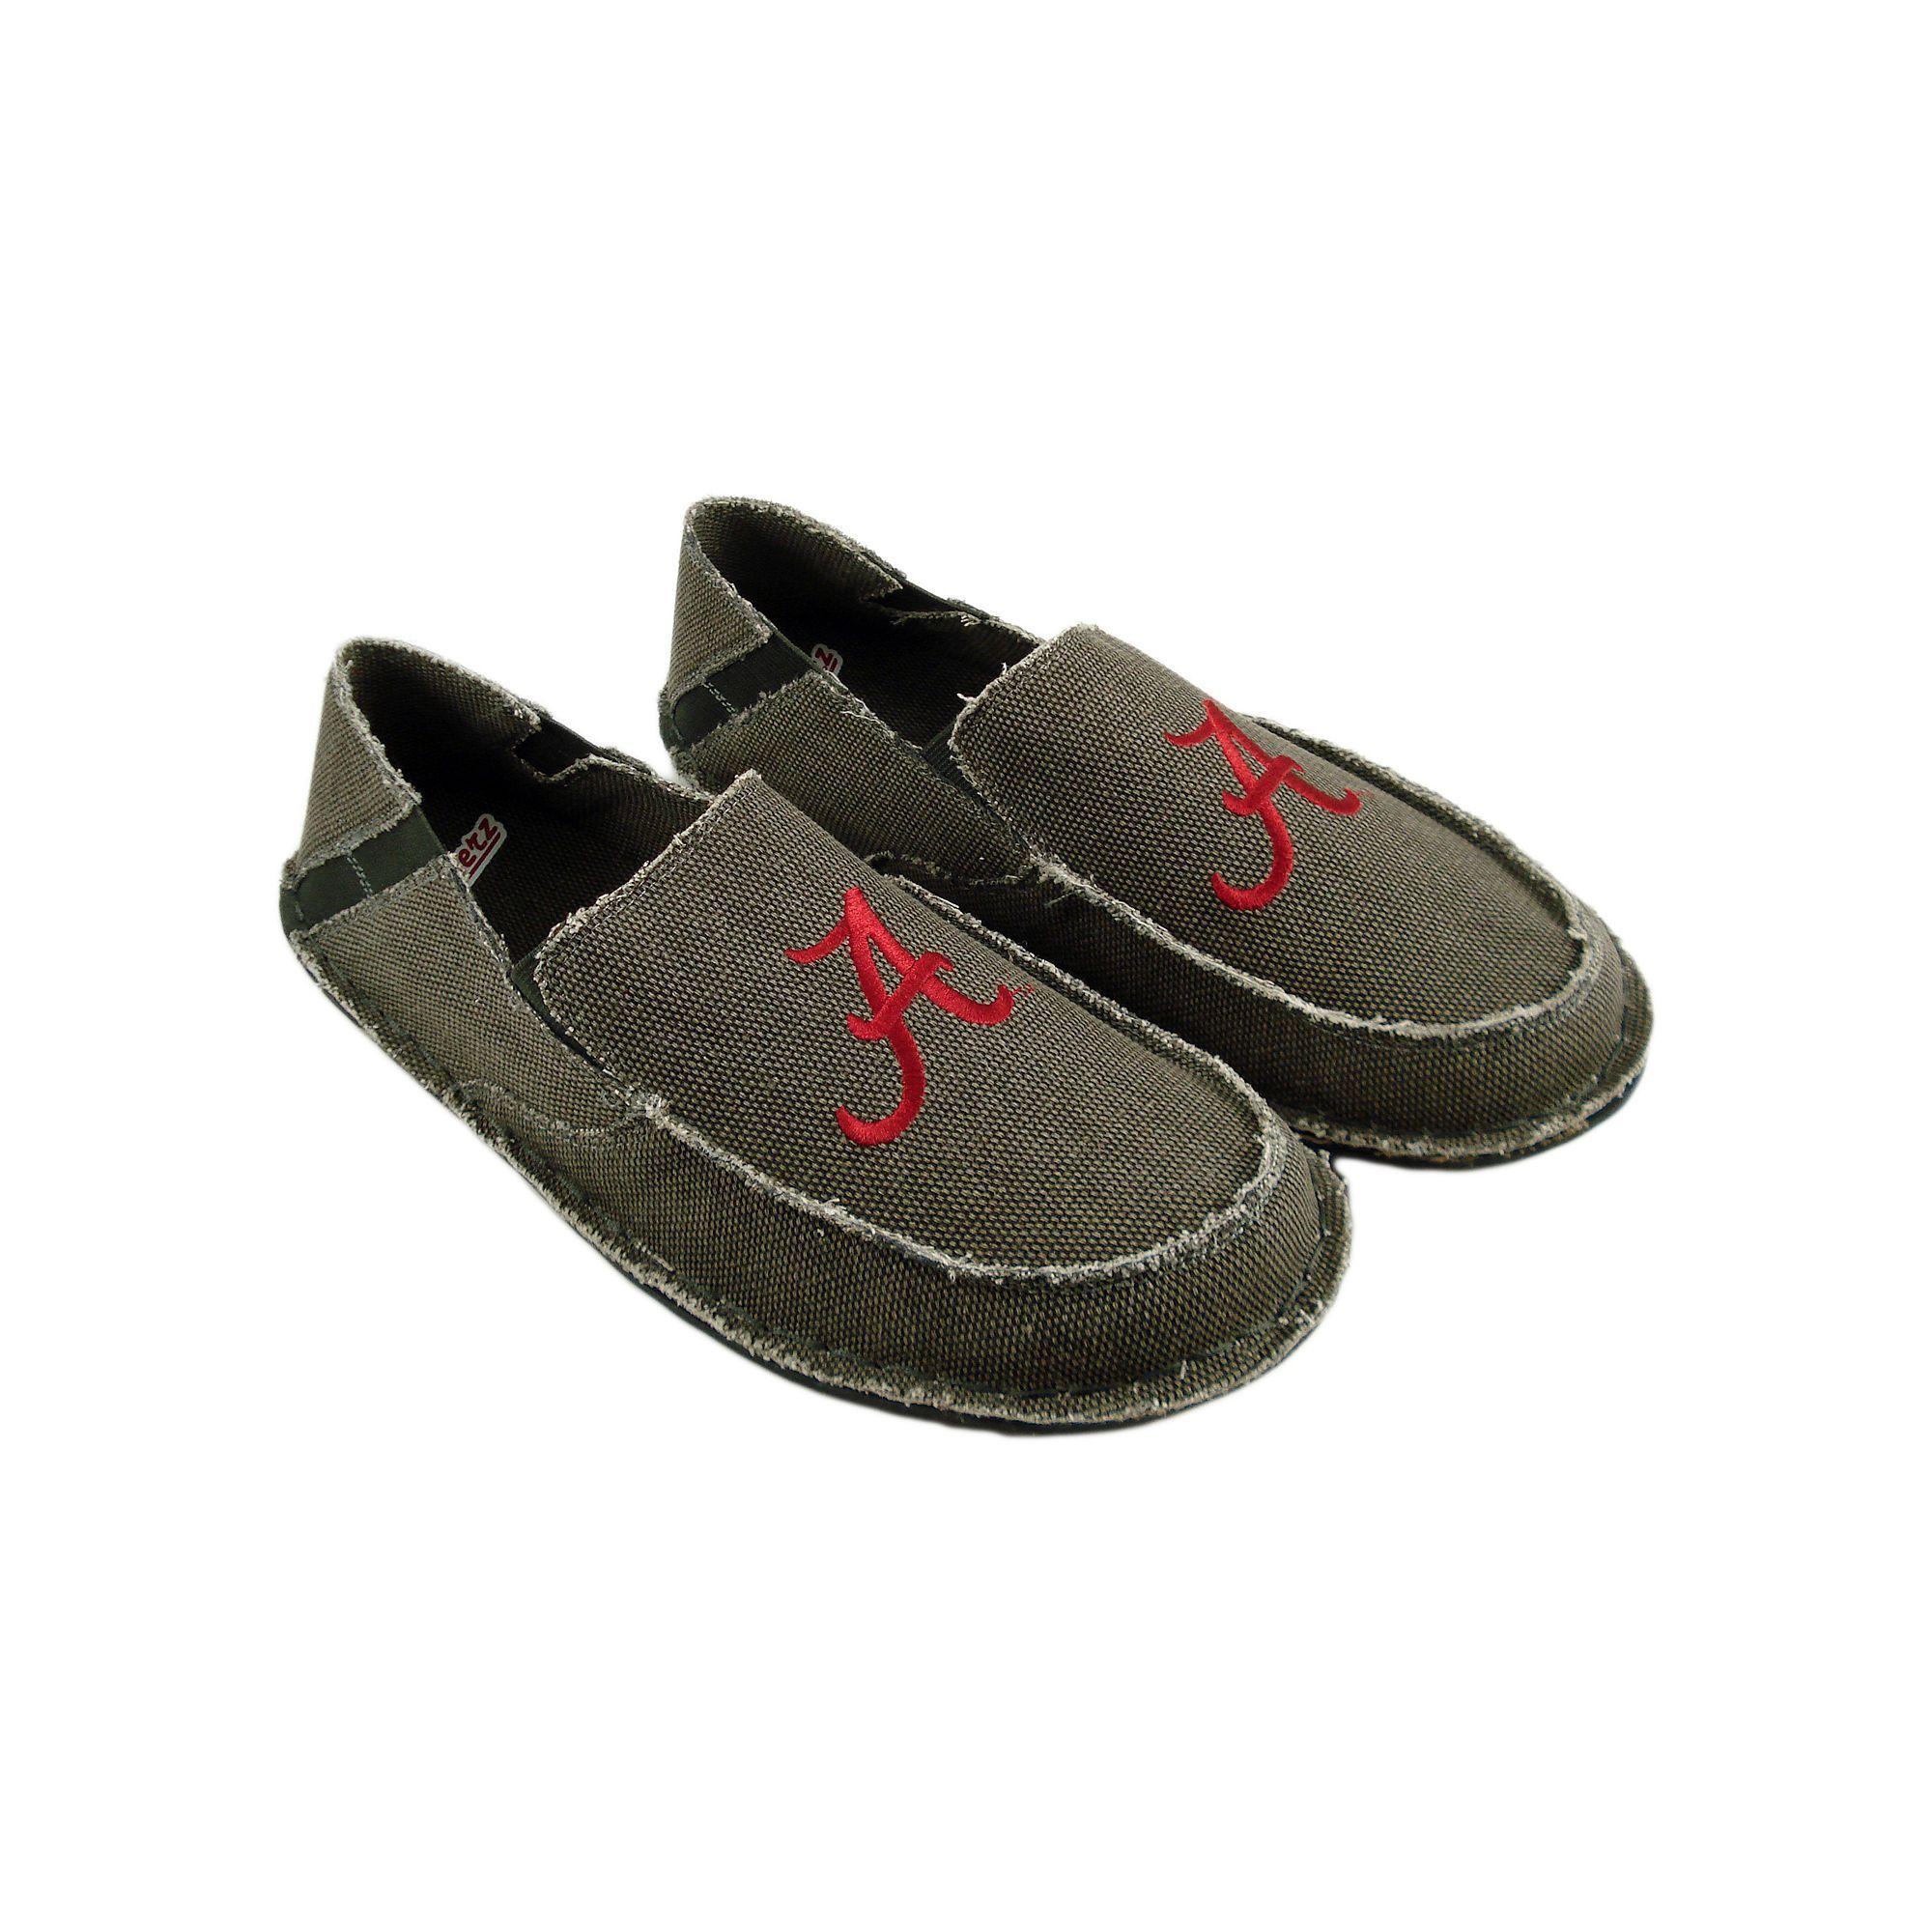 fab5c7d72f0 Mens Alabama Crimson Tide Cazulle Canvas Loafers Size 11